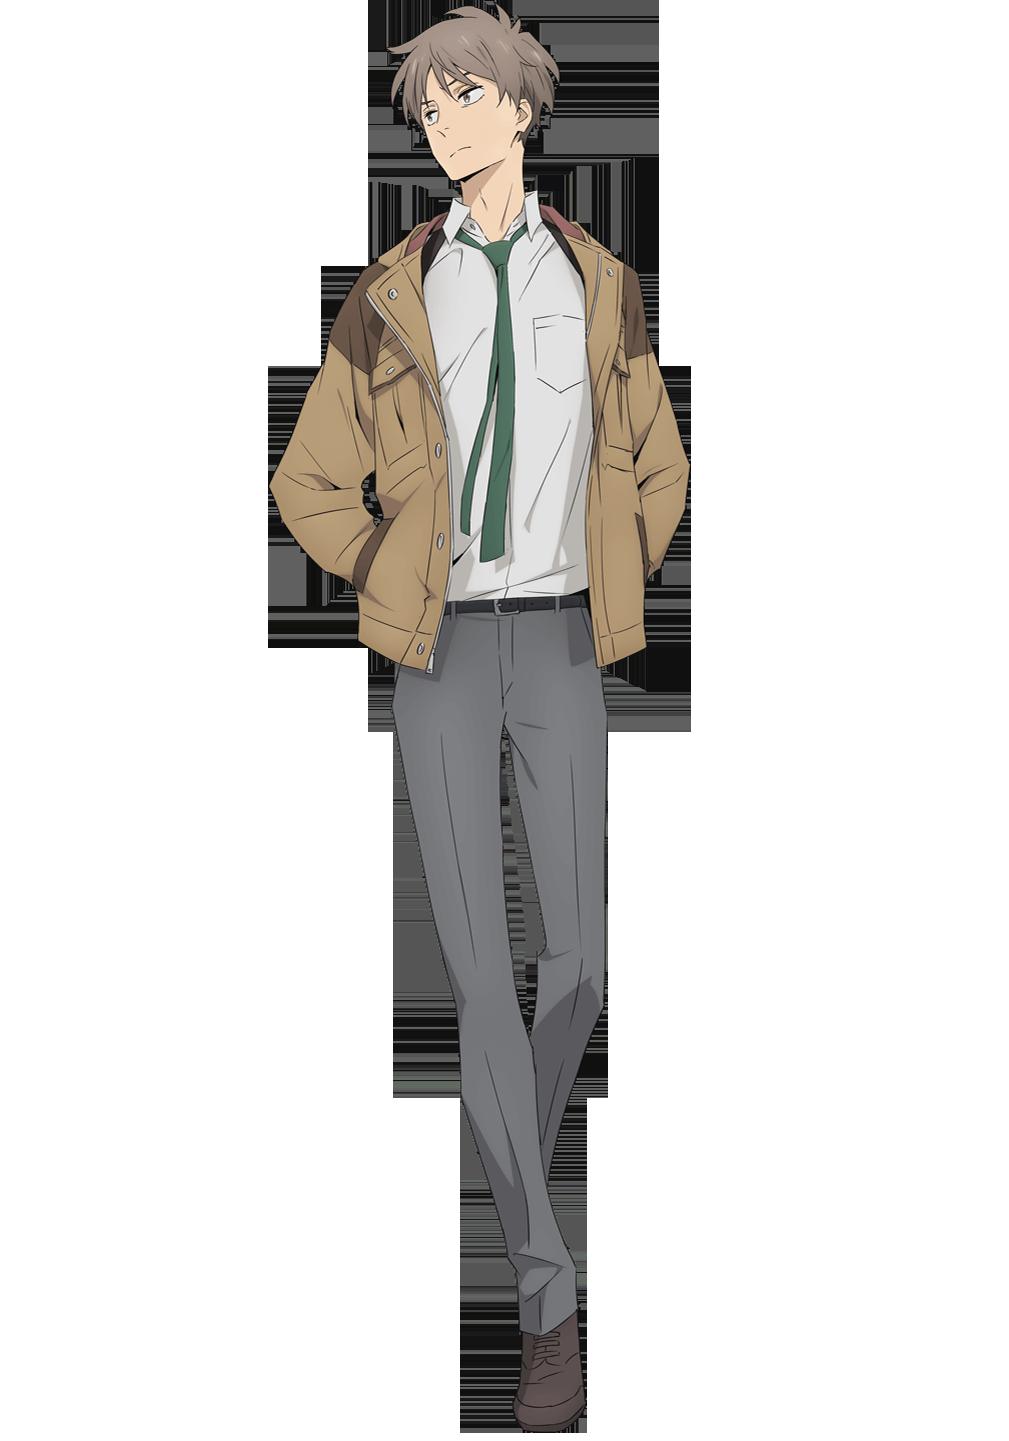 Haru Kato